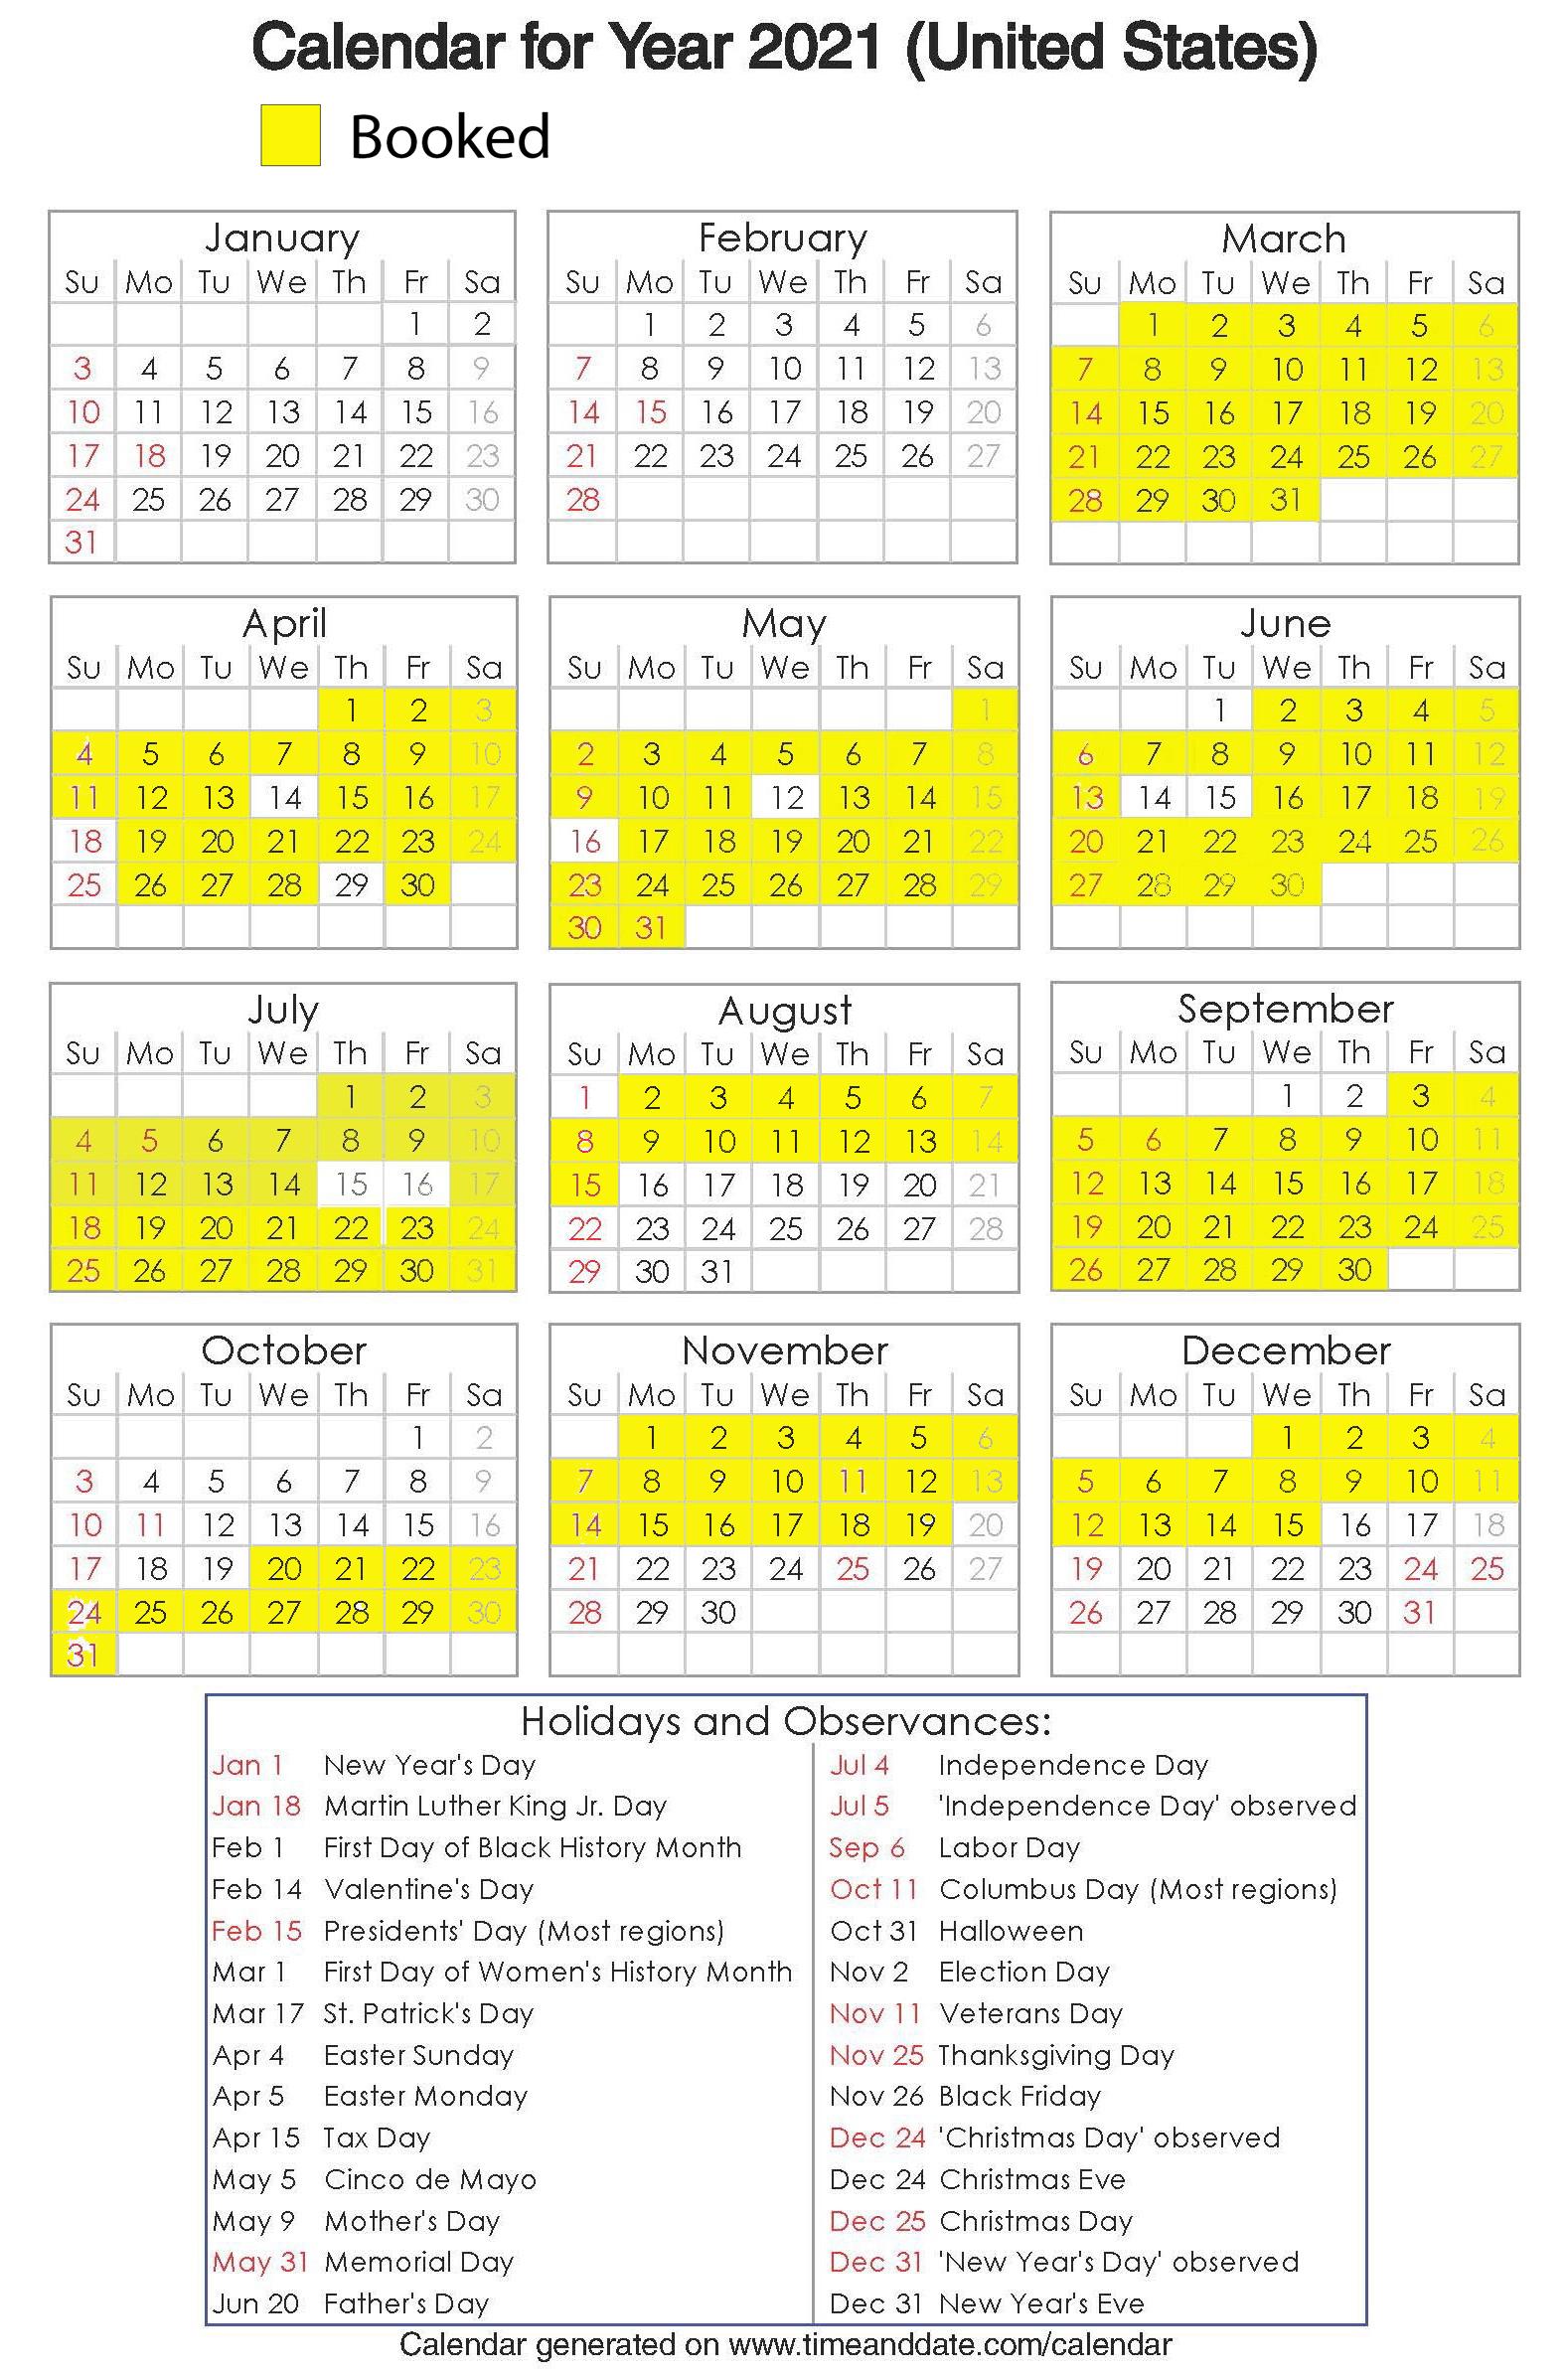 Year 2021 Calendar – United States 19